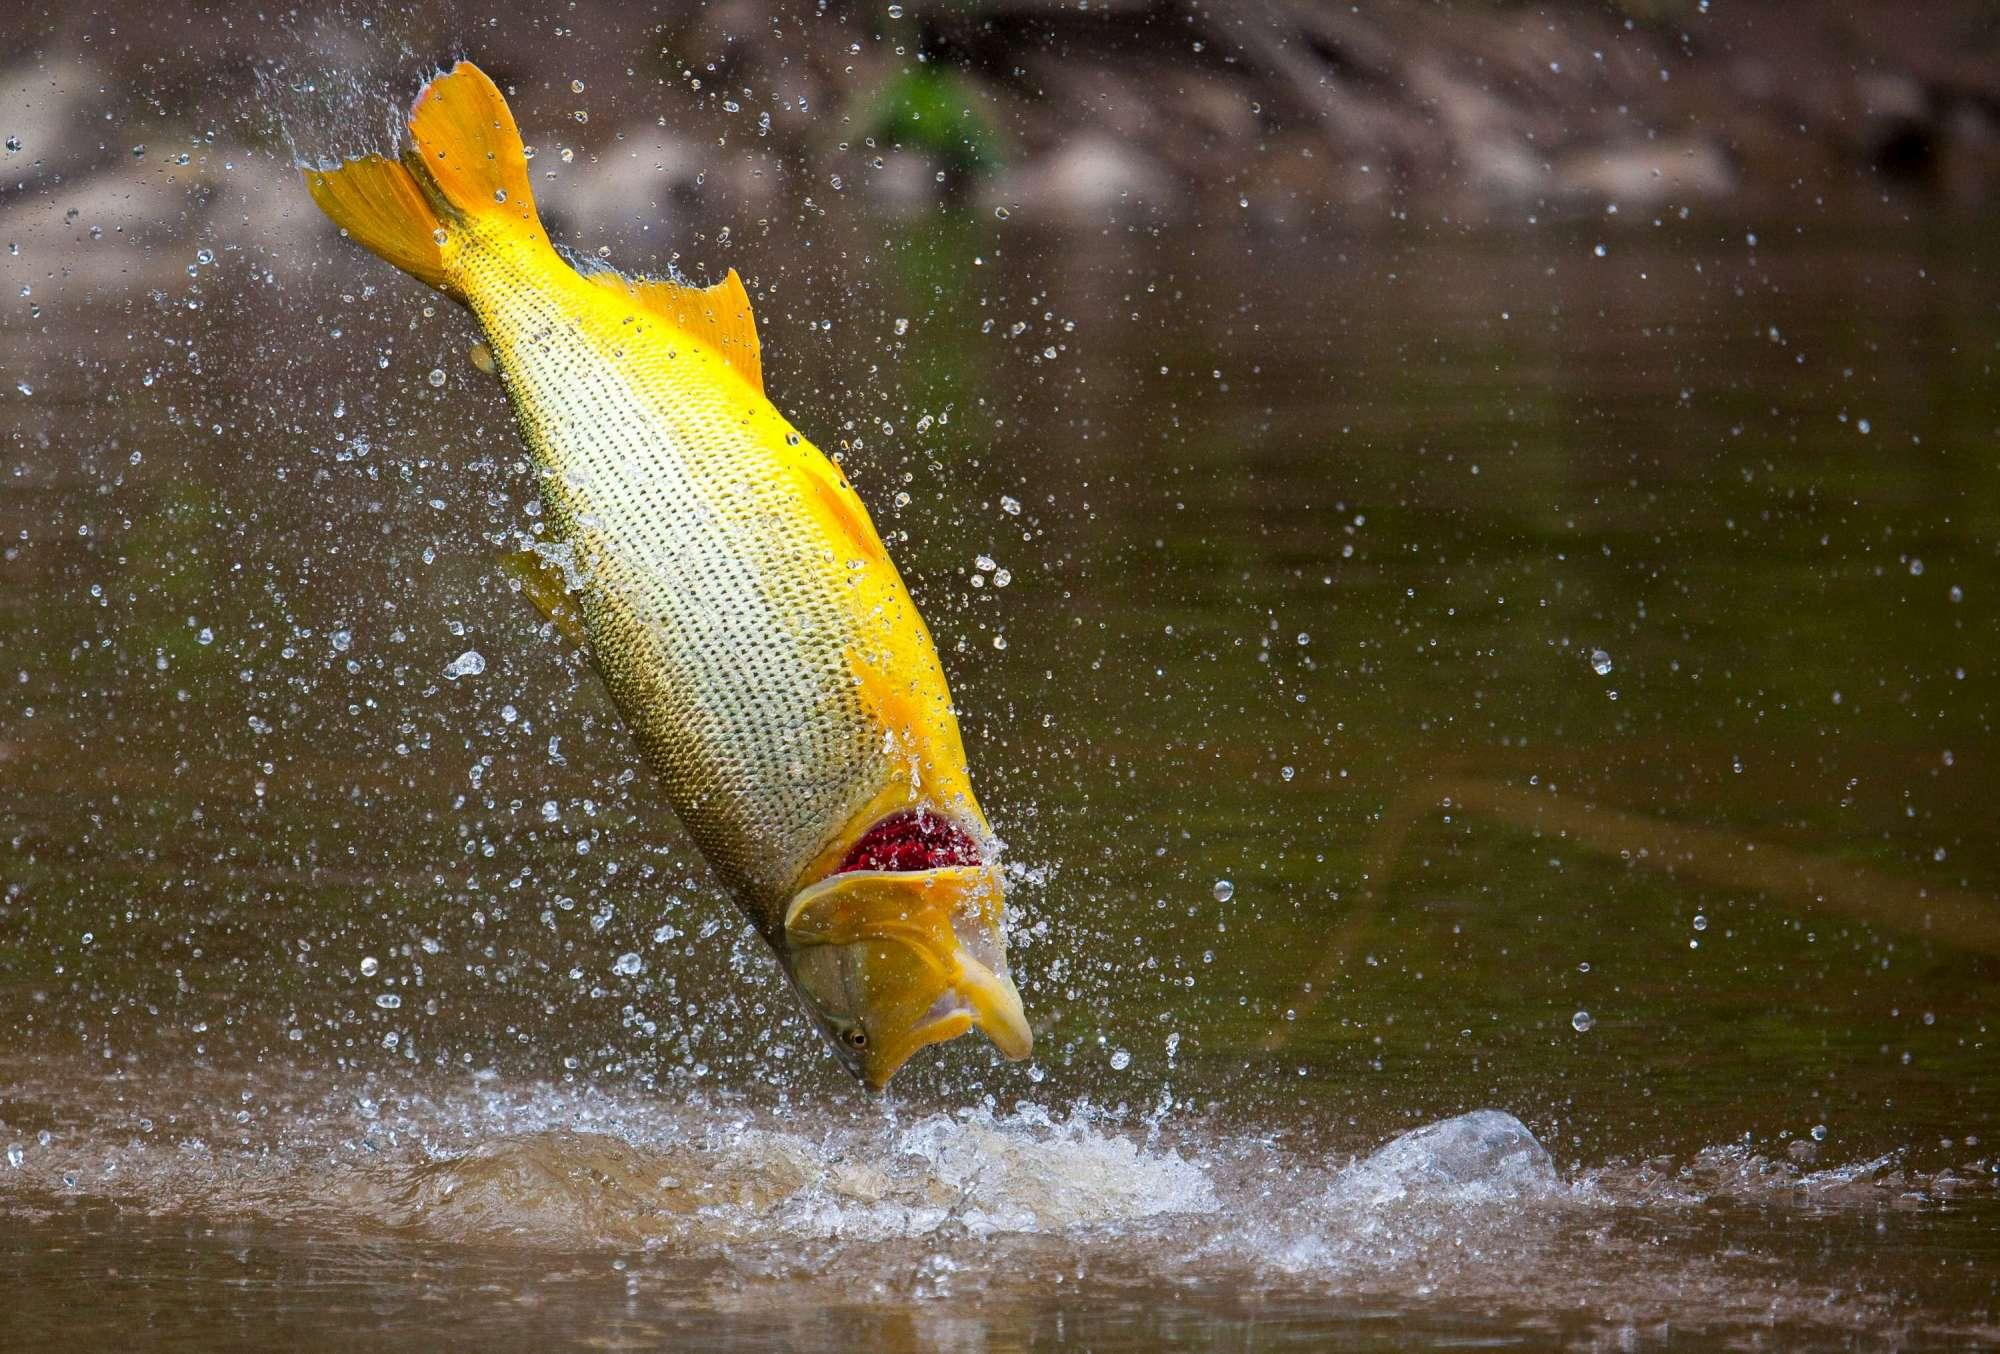 Golden Dorado River Cruiser, fly fishing golden dorado, golden dorado fishing, catching golden dorado, fishing Argentina, Estancia Laguna Verde, popper fishing, fly fishing tips, aardvark mcleod